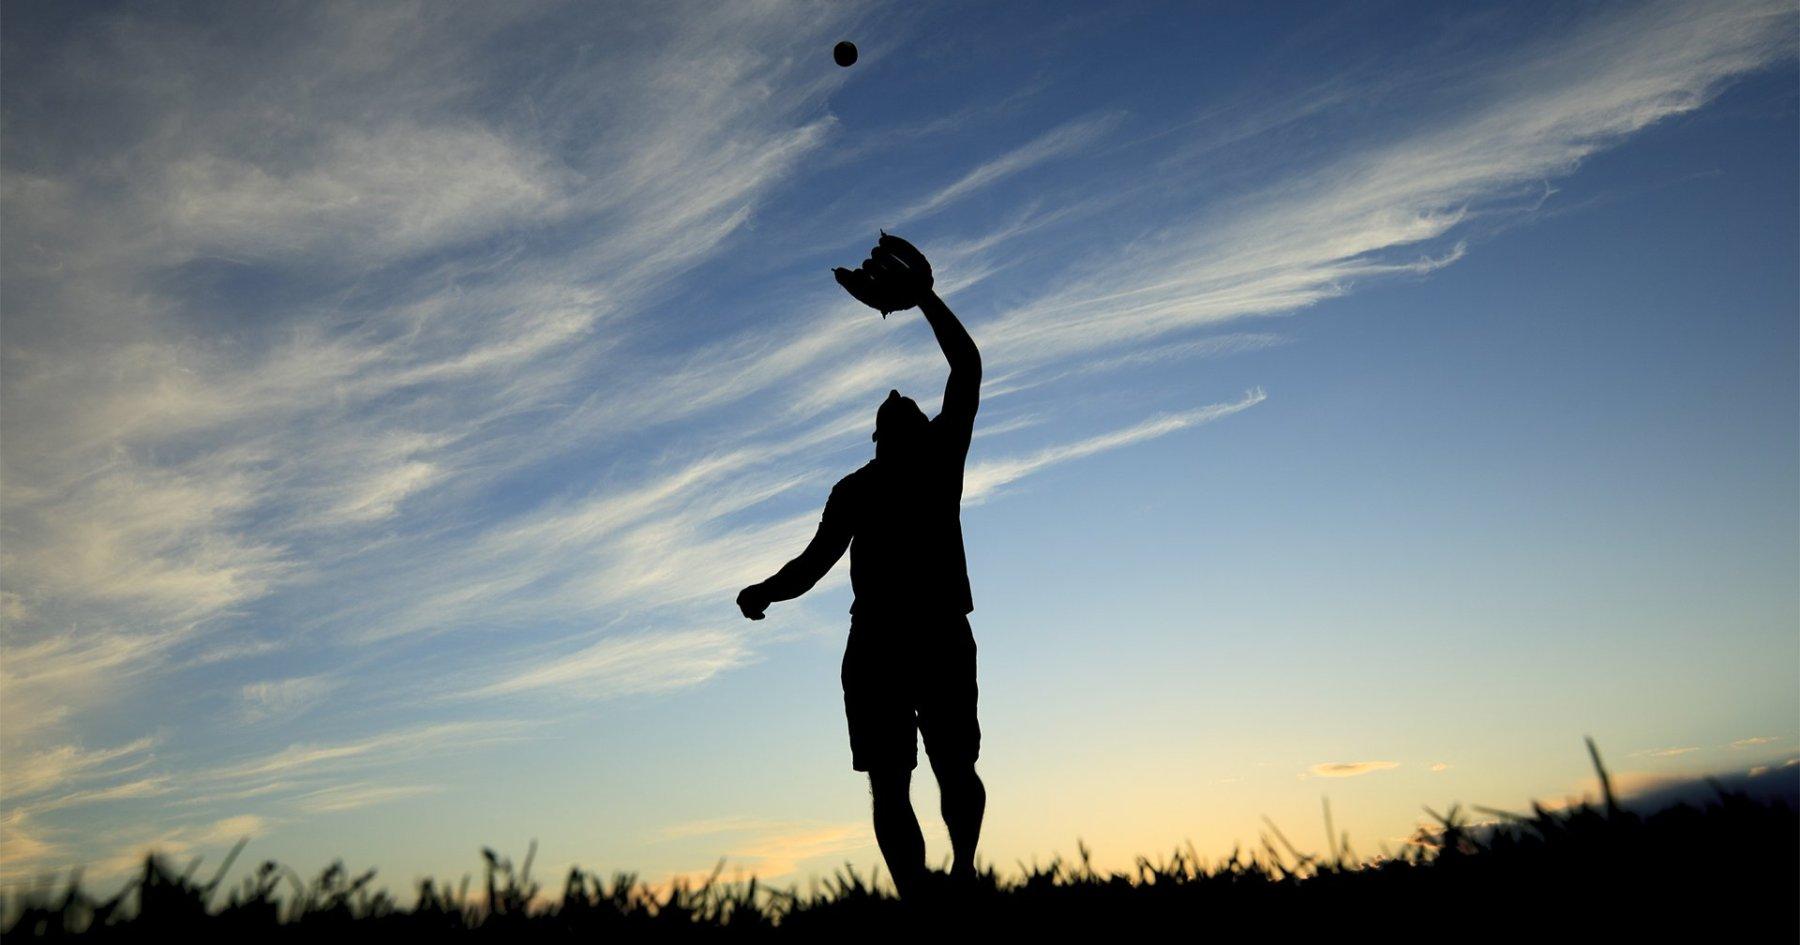 The 10 Commandments of Beer League Softball